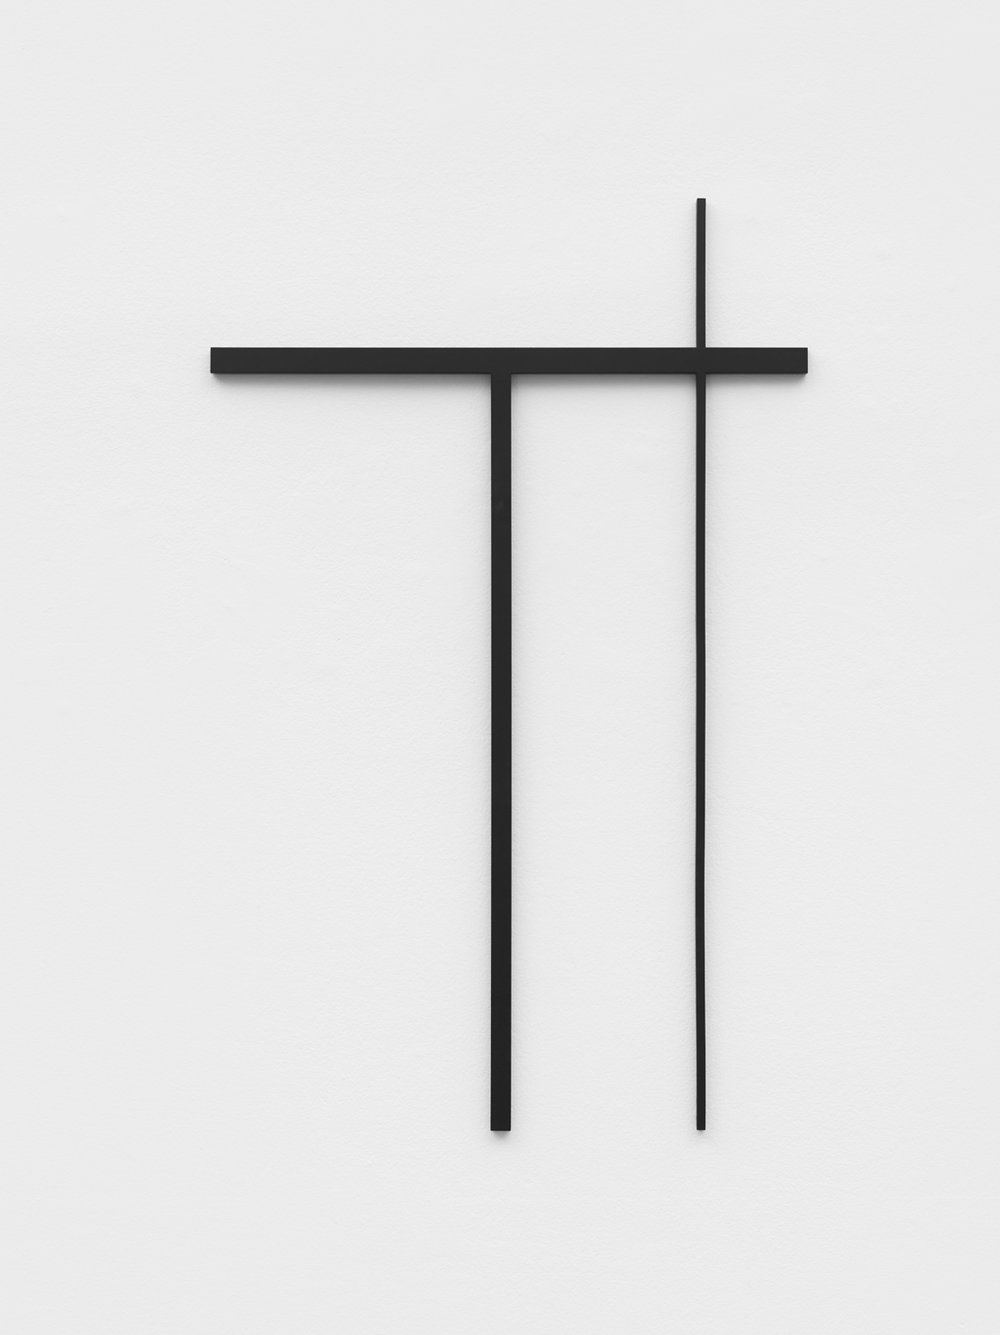 Philippe Decrauzat   Fragment after a sketch , 2018 steel, paint  63,4 x 98,7 cm - 25 x 38 7/8 in